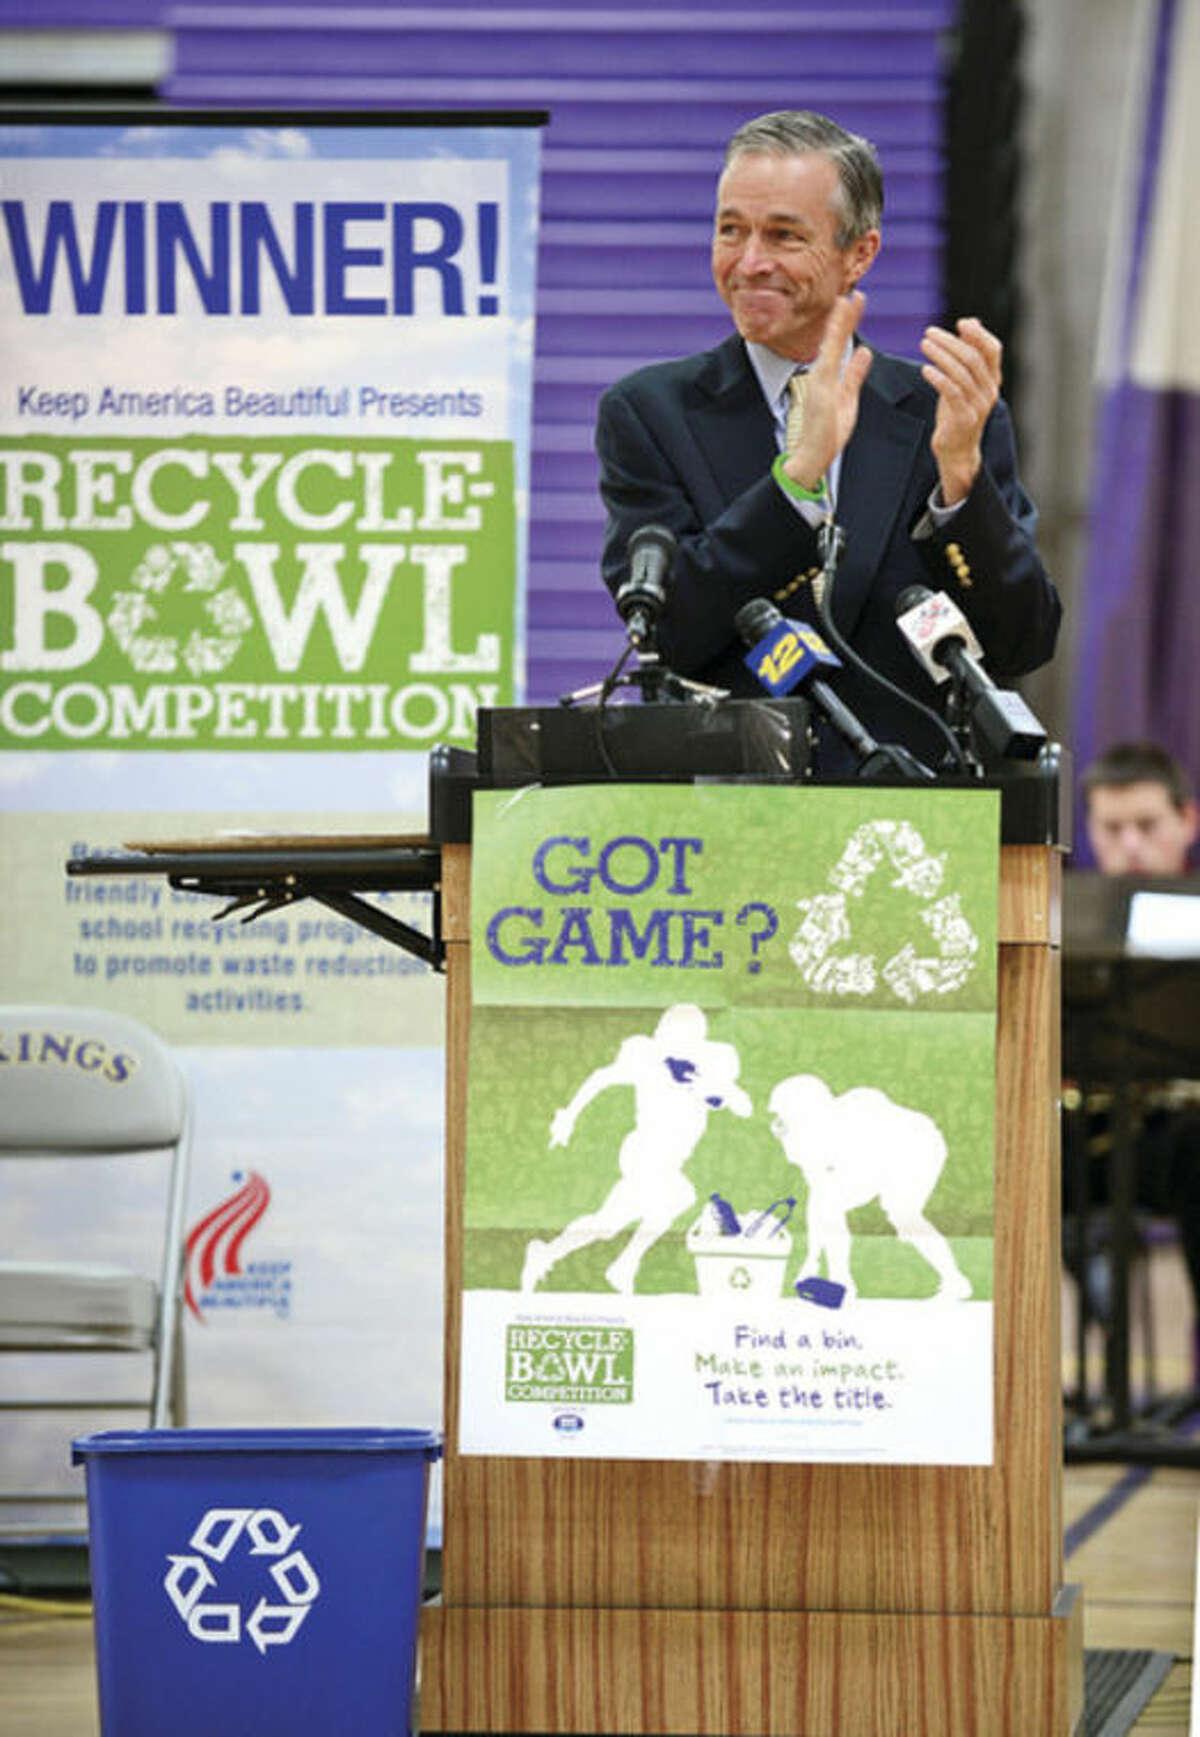 Hour photo / Erik Trautmann Keep America Beautiful president Matt McKenna speaks as Stamford's Westhill High School holds an award ceremony for the Keep America Beautiful Recycling Bowl win.